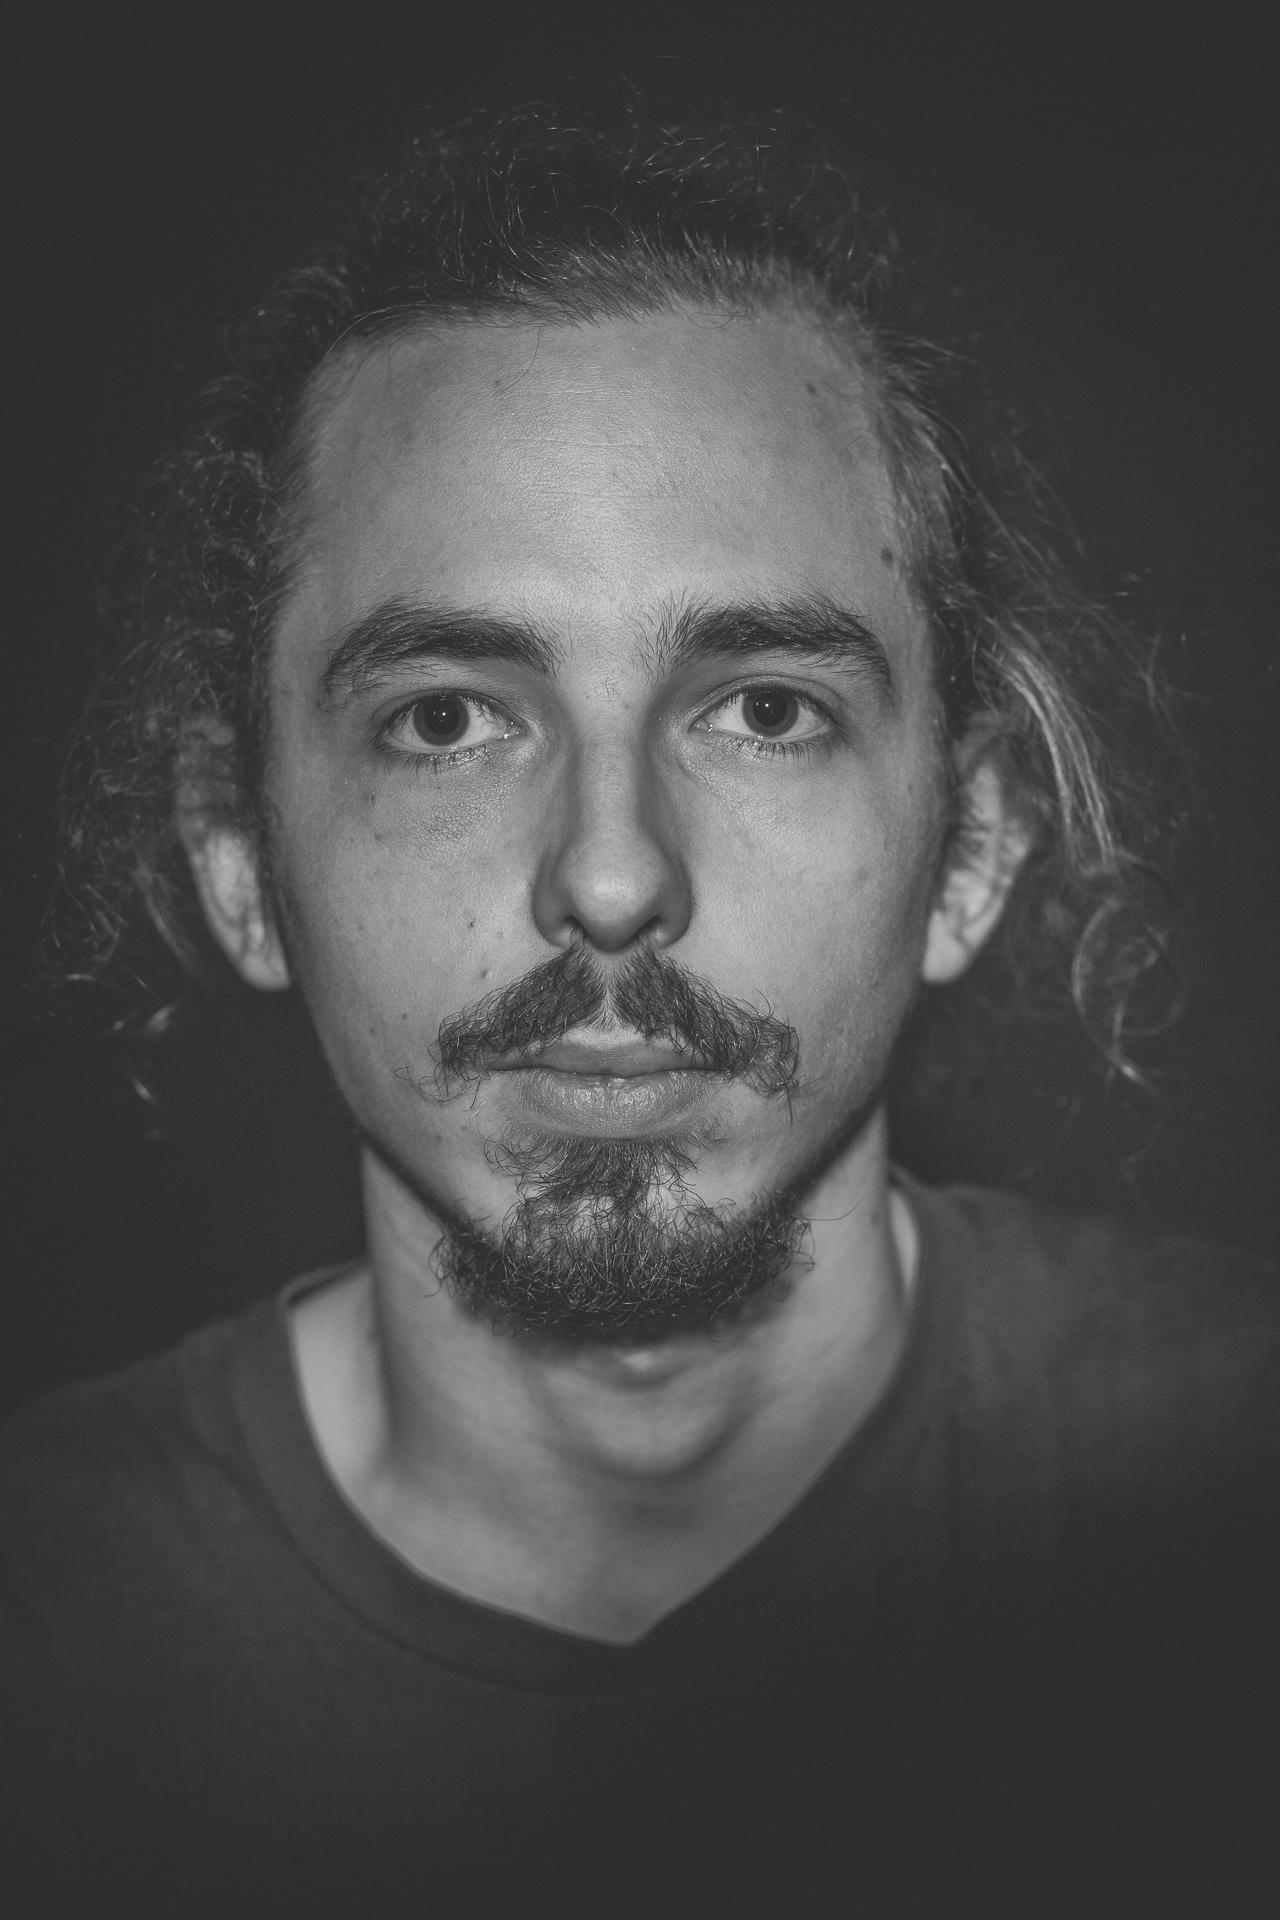 fot. Piotr Krzyk